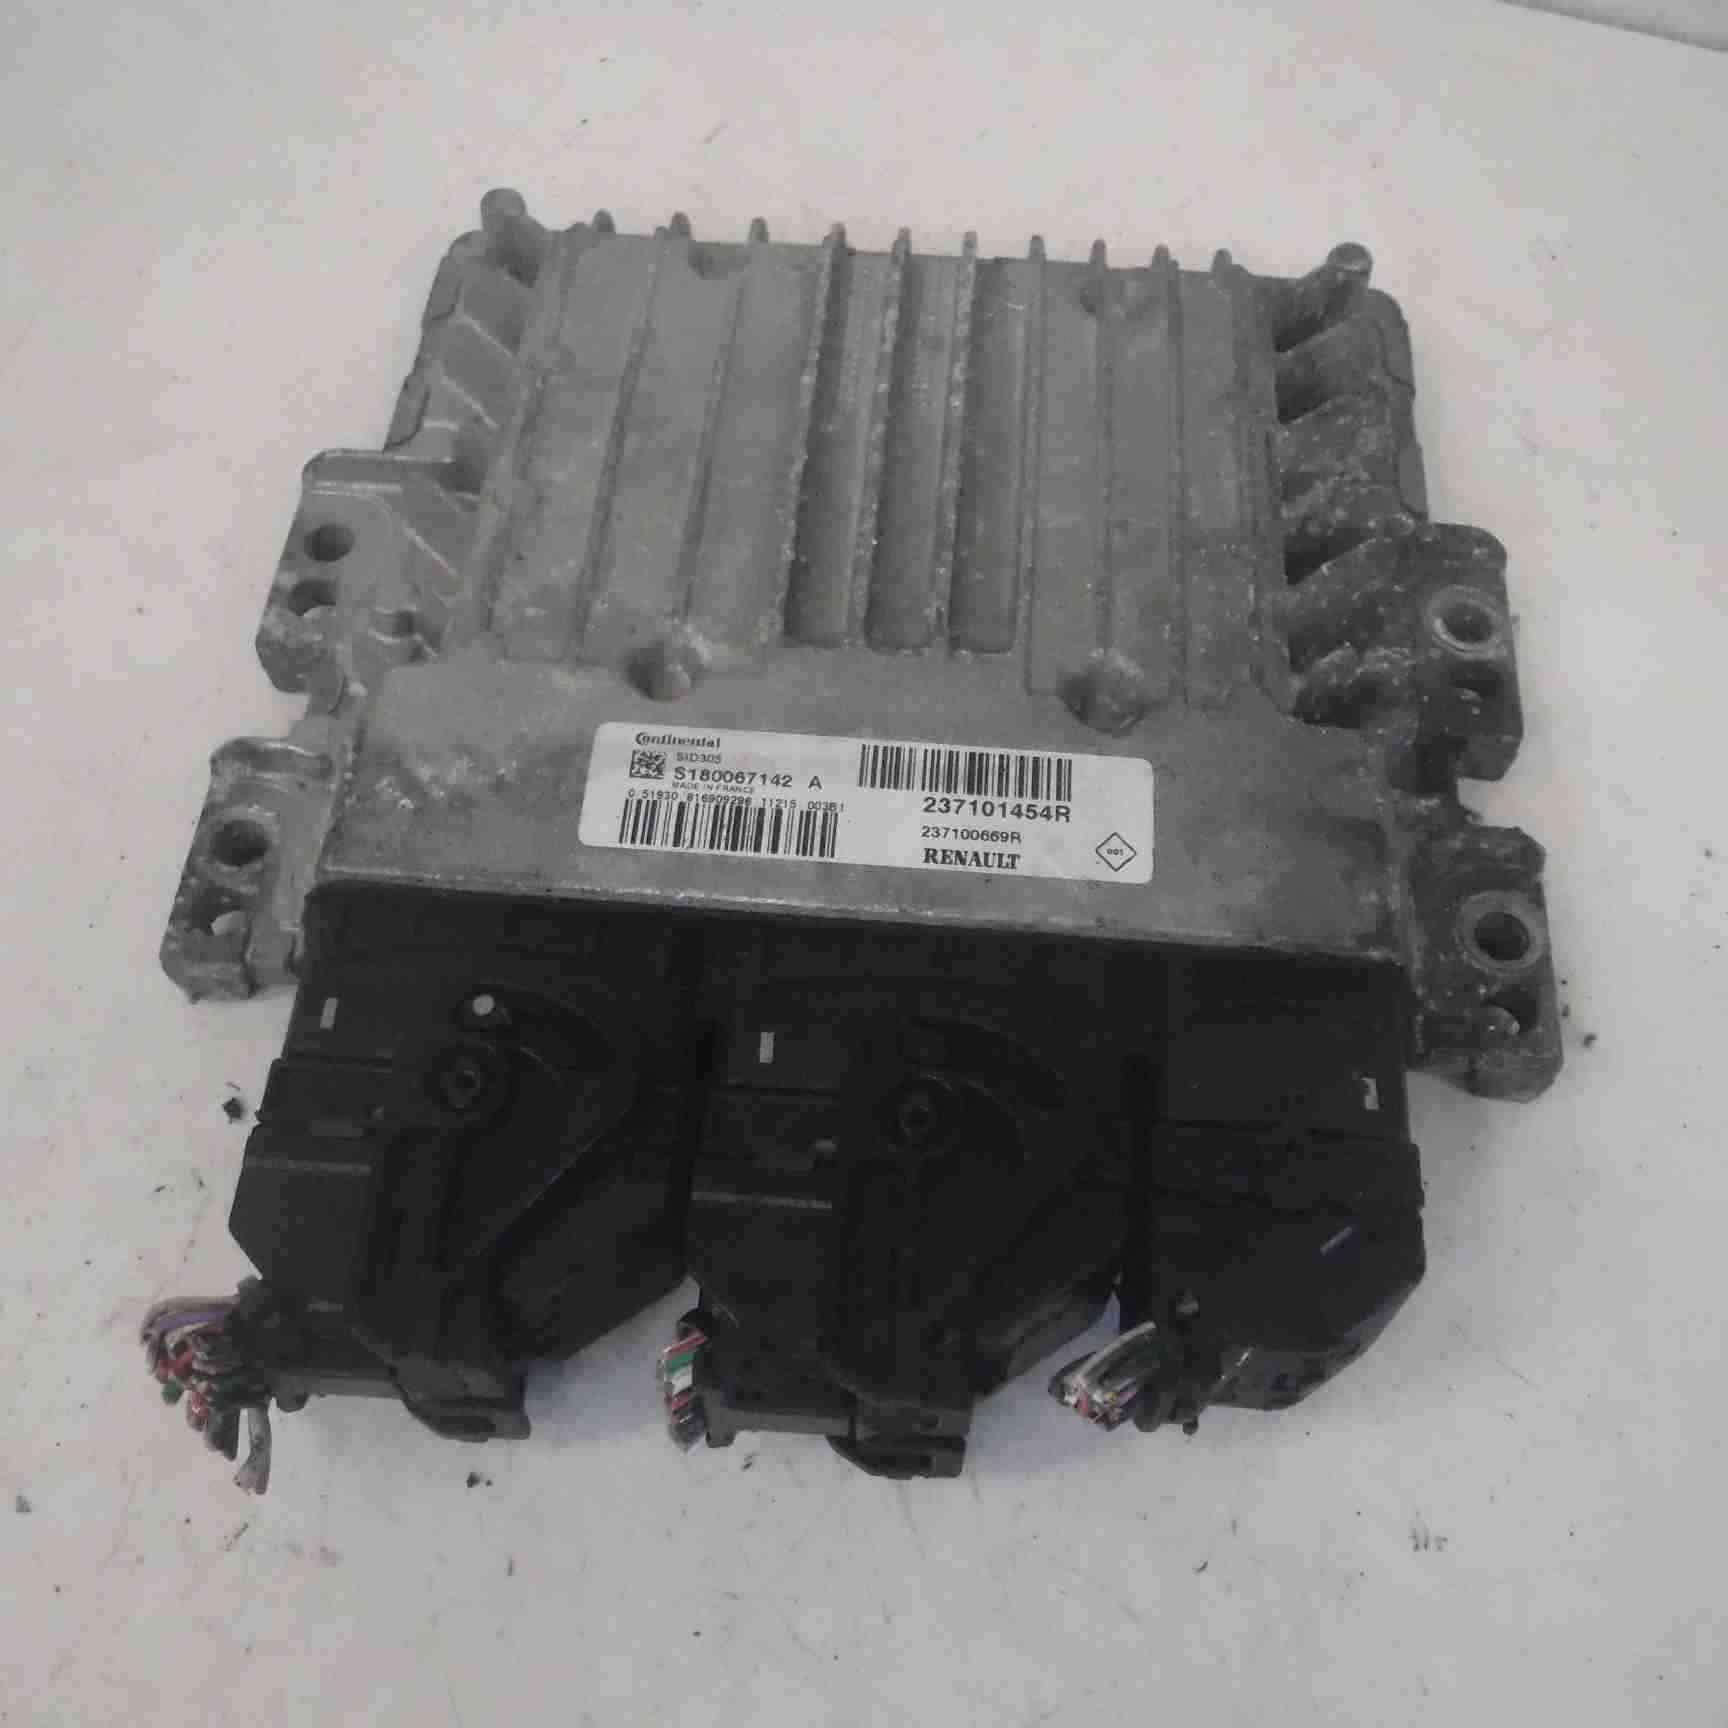 Renault Megane MK3 2008-2012 Engine Control Unit Module 237101454R